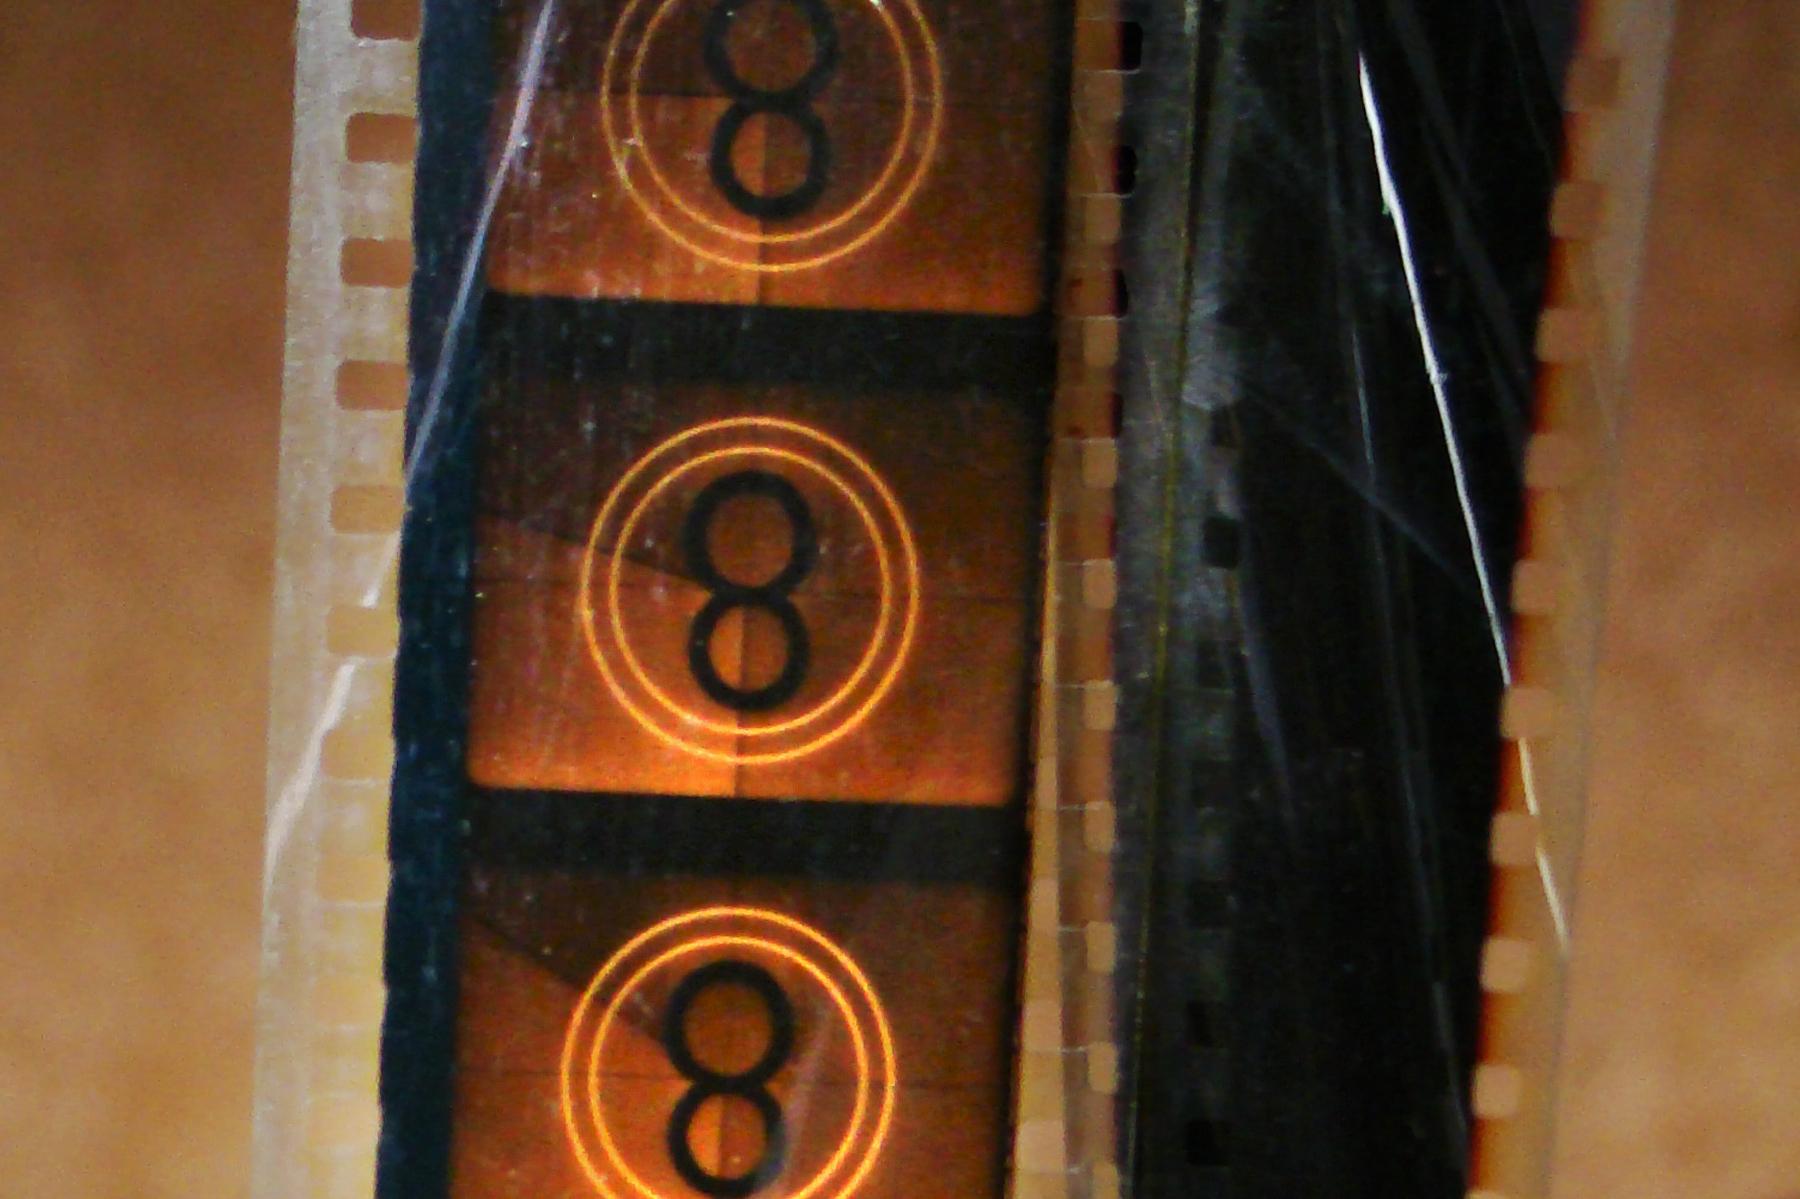 http://upload.wikimedia.org/wikipedia/commons/9/94/Eight_(film_start)_cropped1.jpg